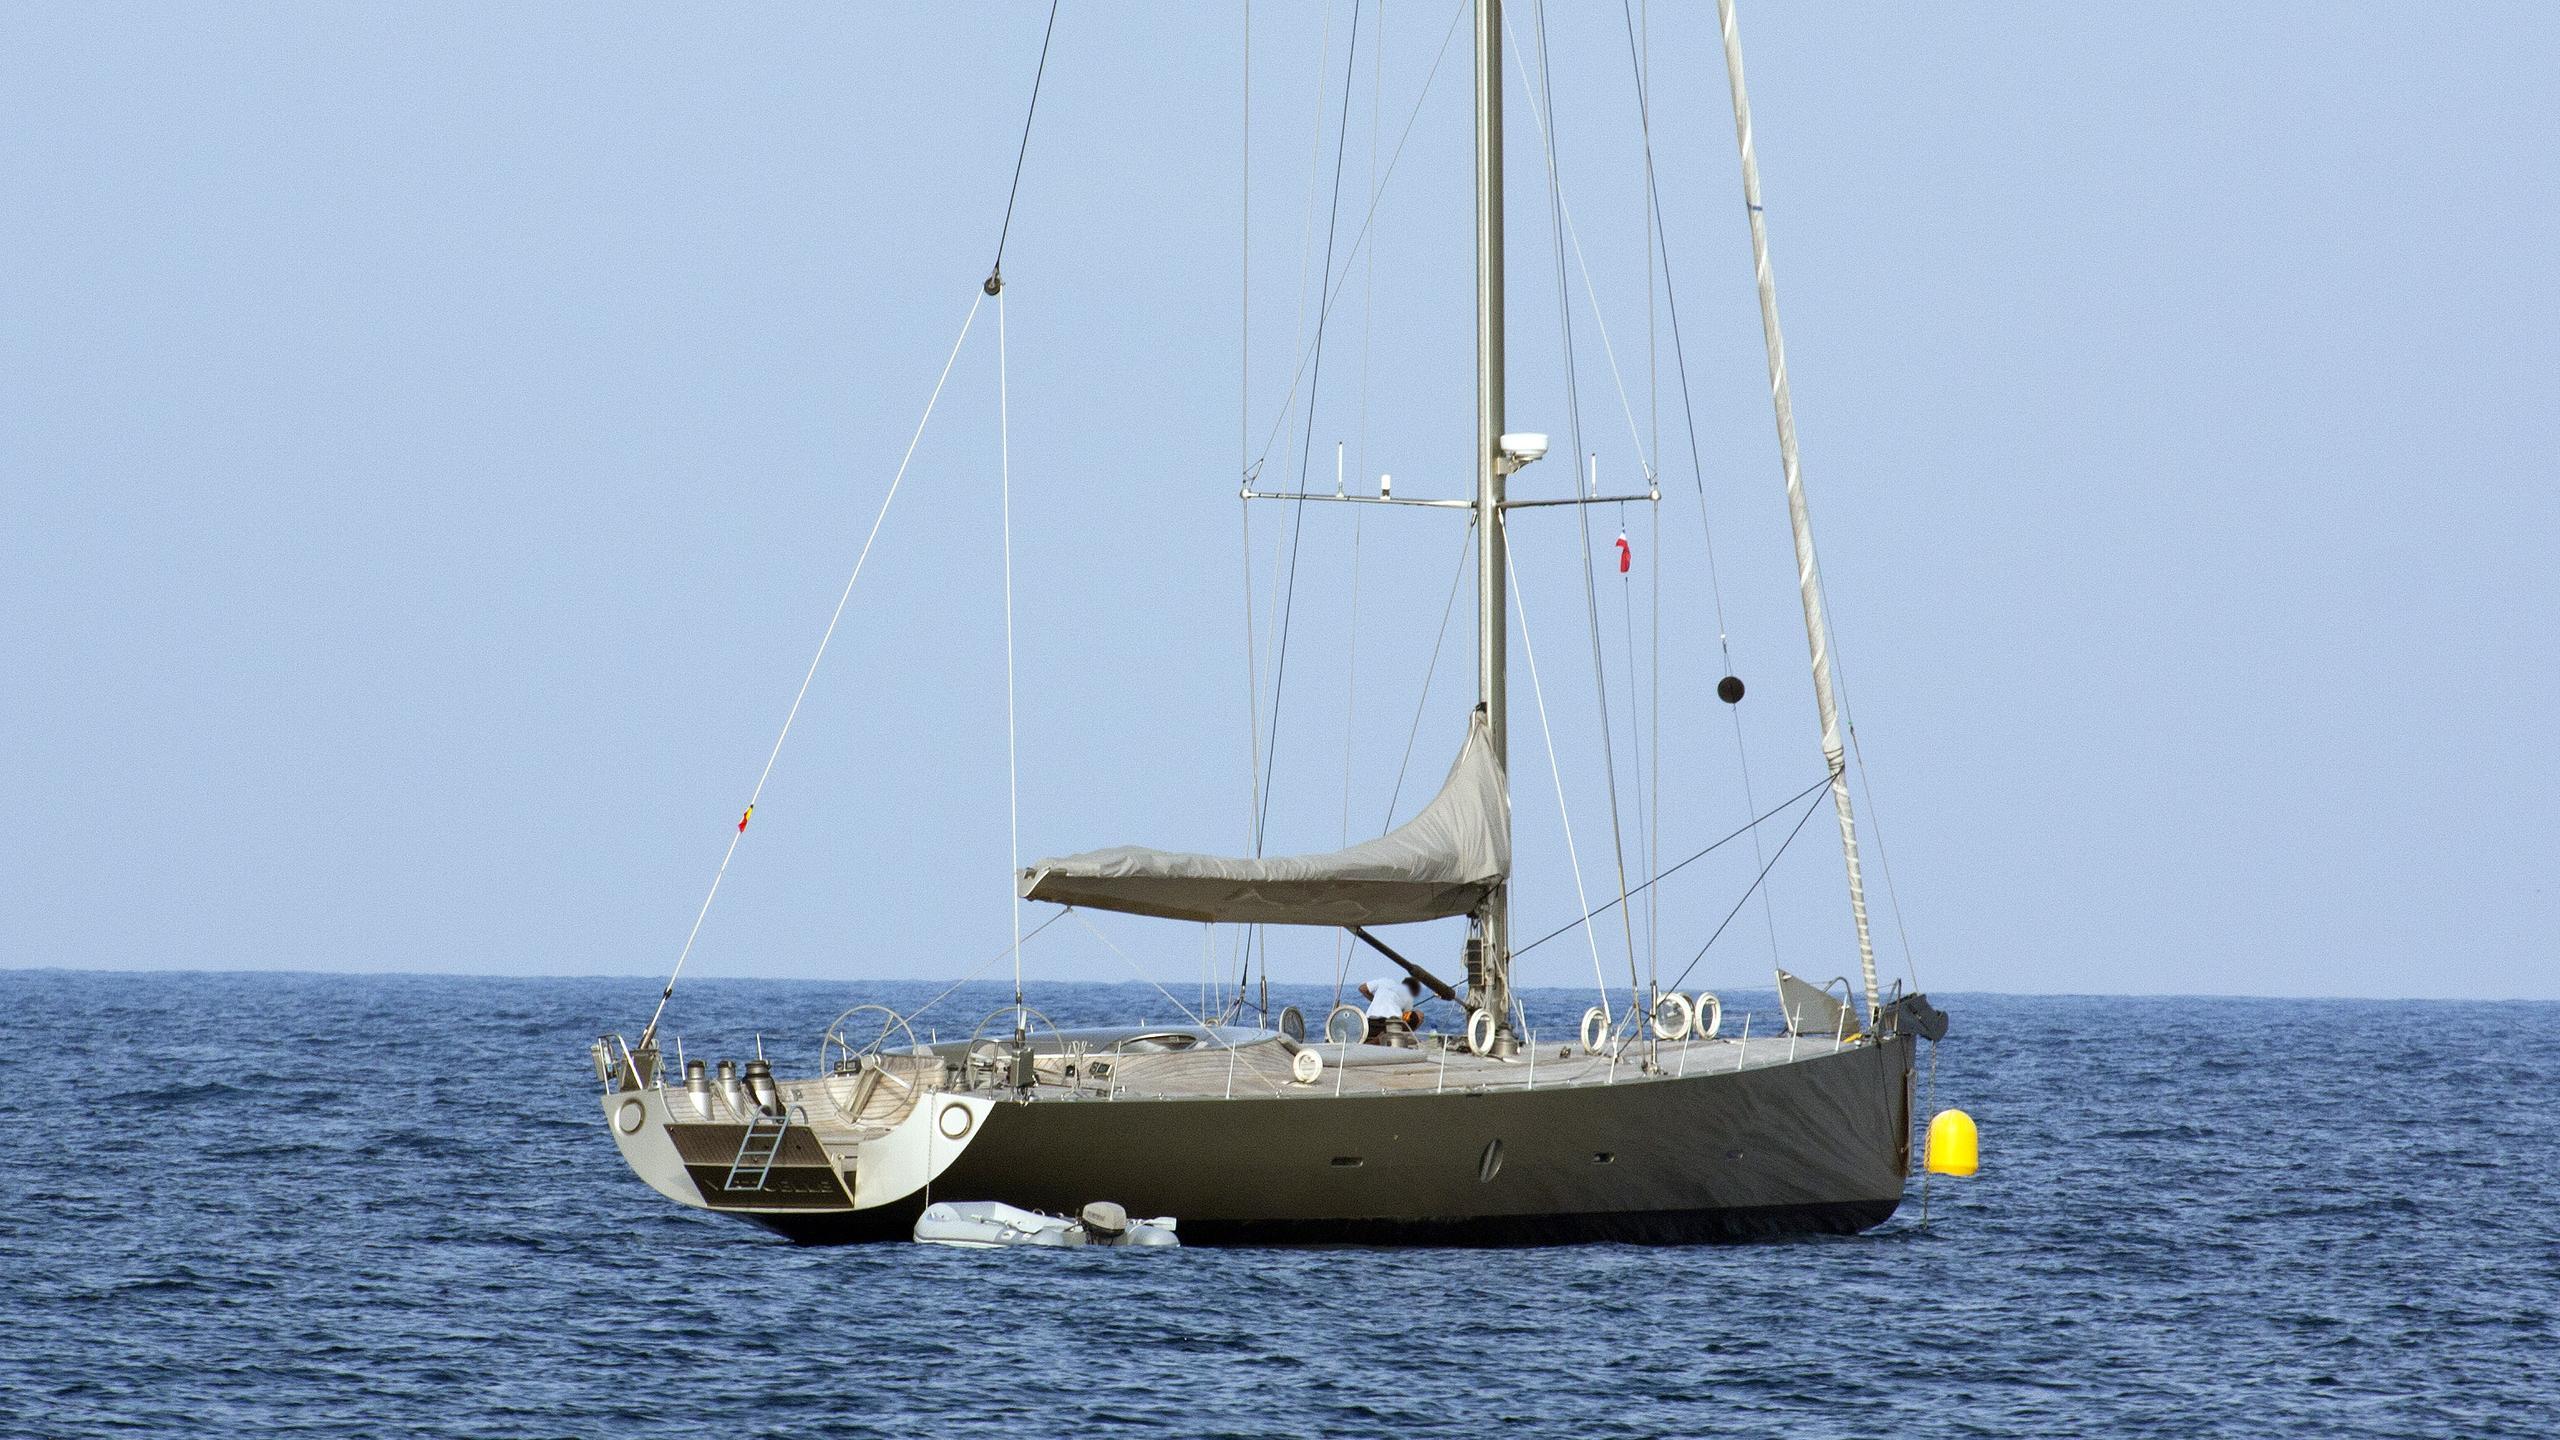 virtuelle-sailing-yacht-tencara-1999-24m-half-profile